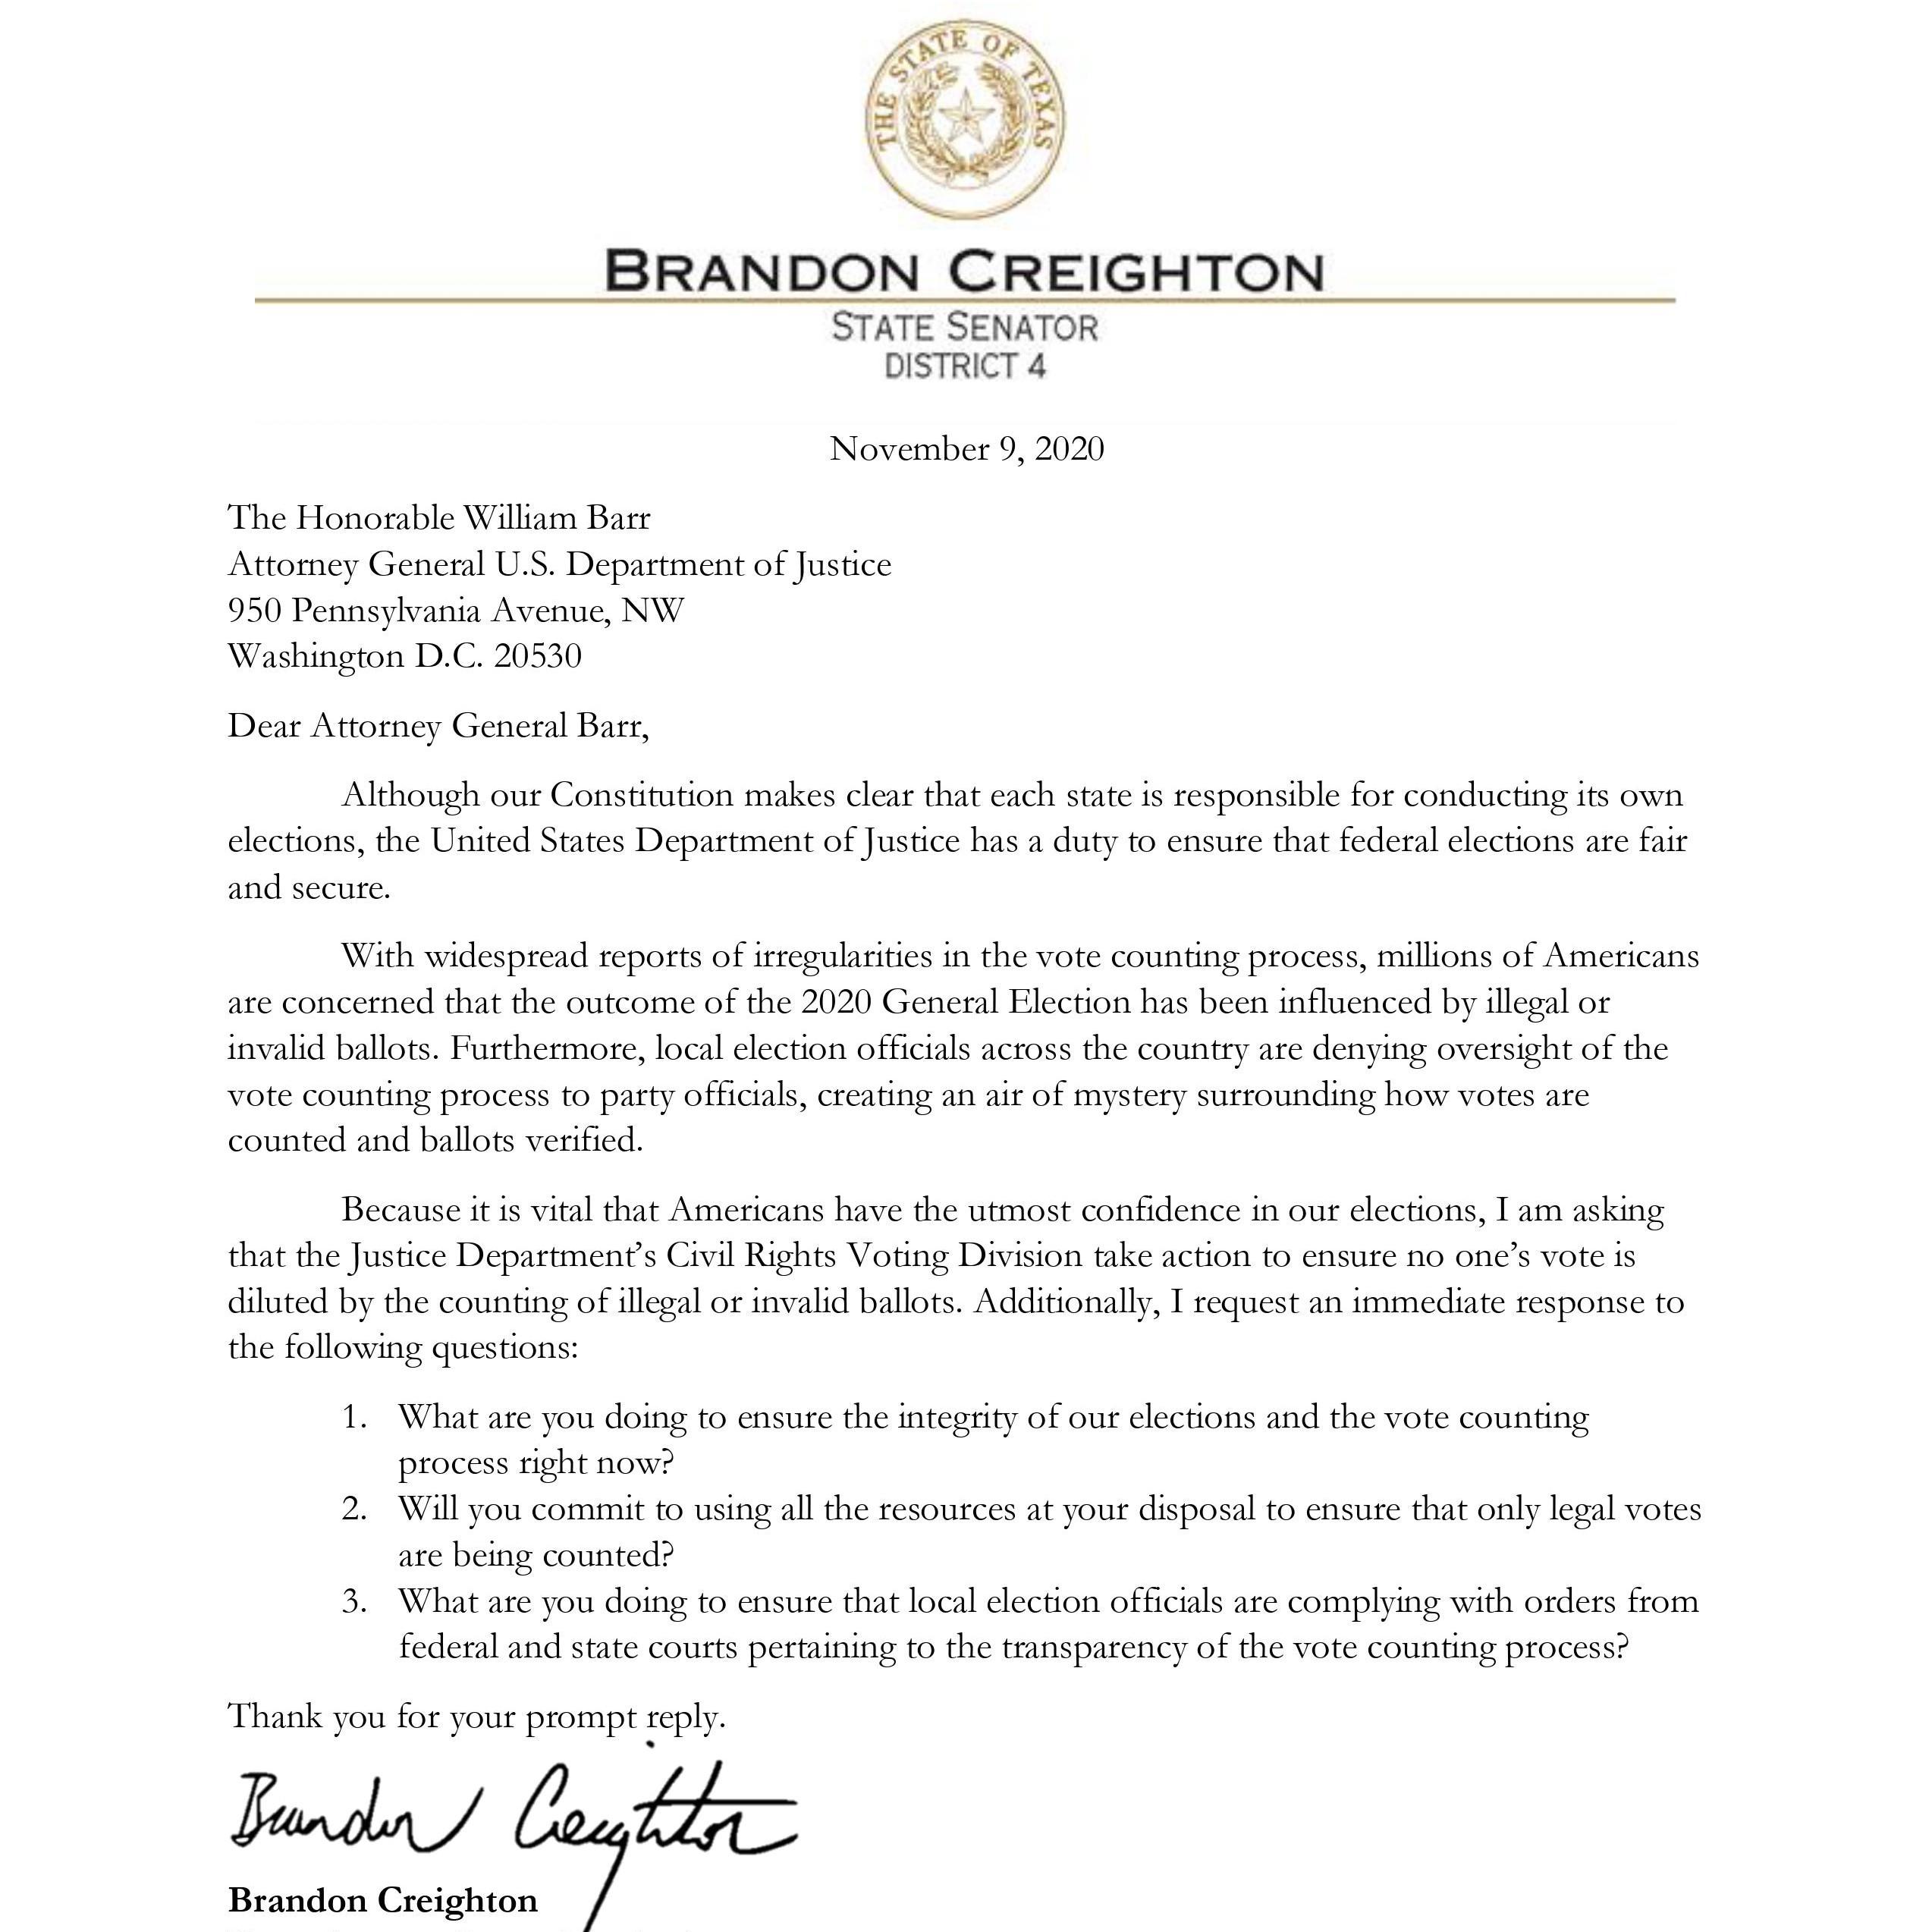 Senator Creighton's letter to Attorney General Barr